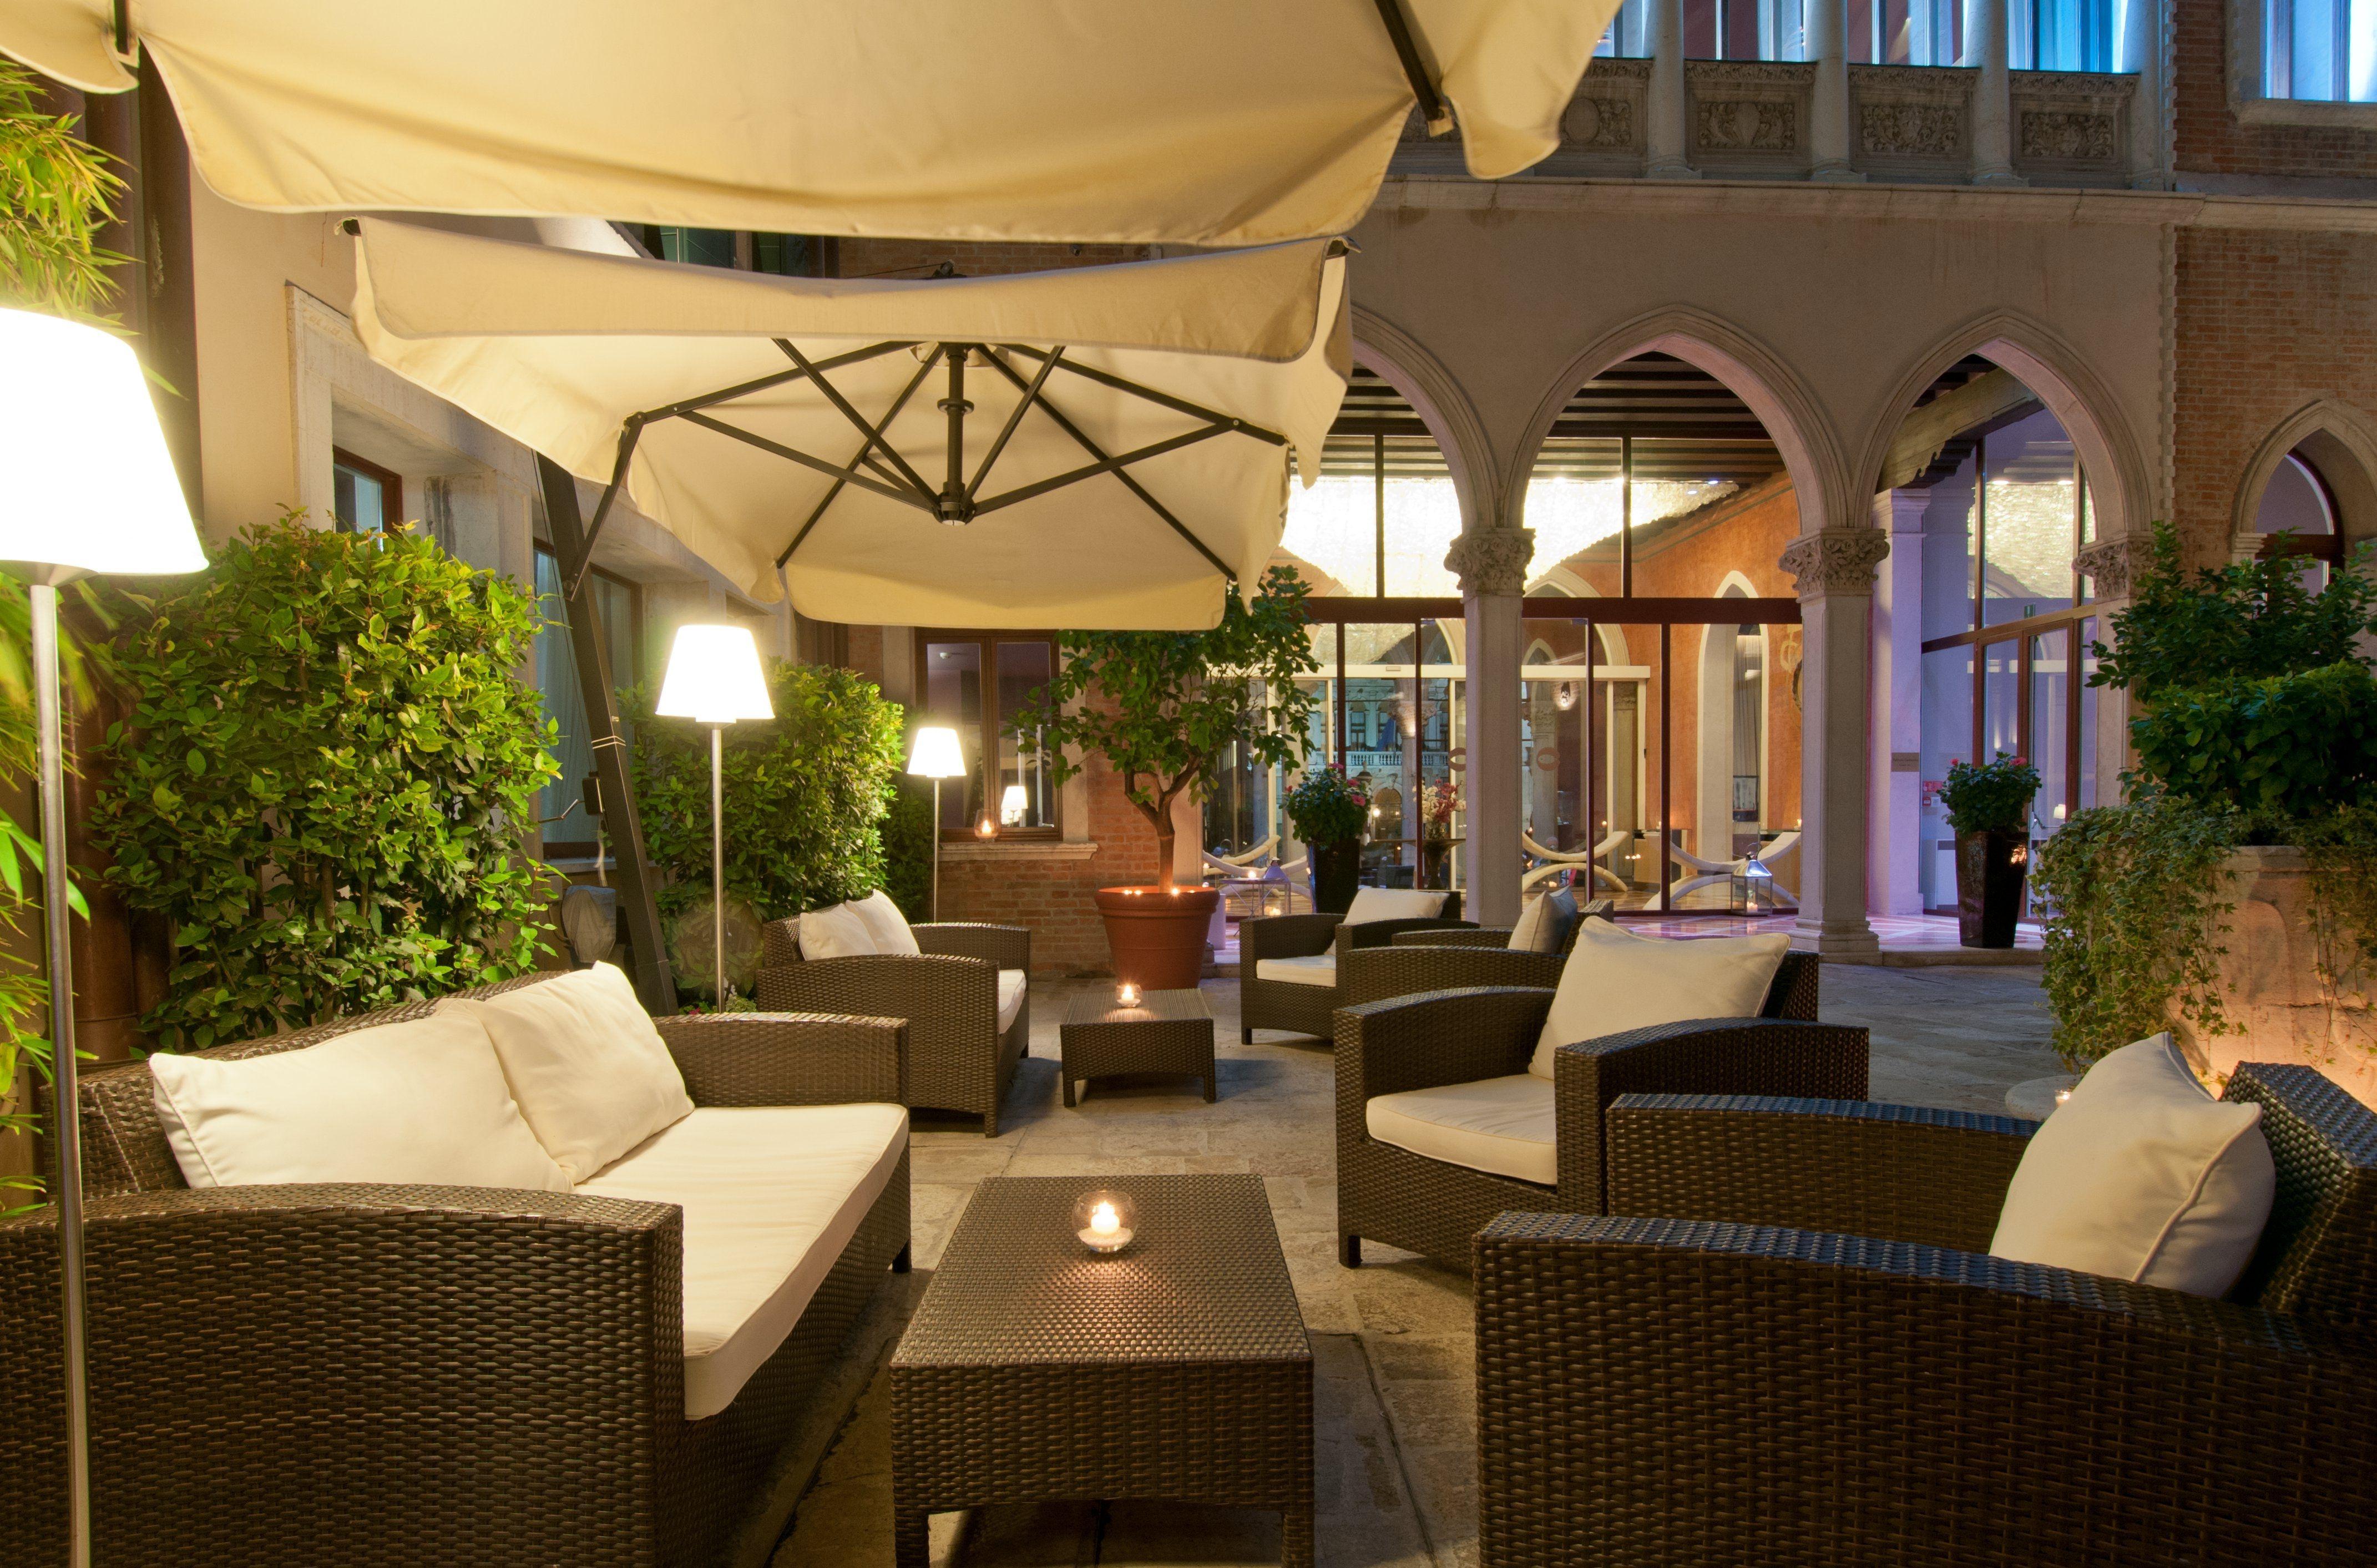 Interior Courtyard for Centurion Palace #Venice